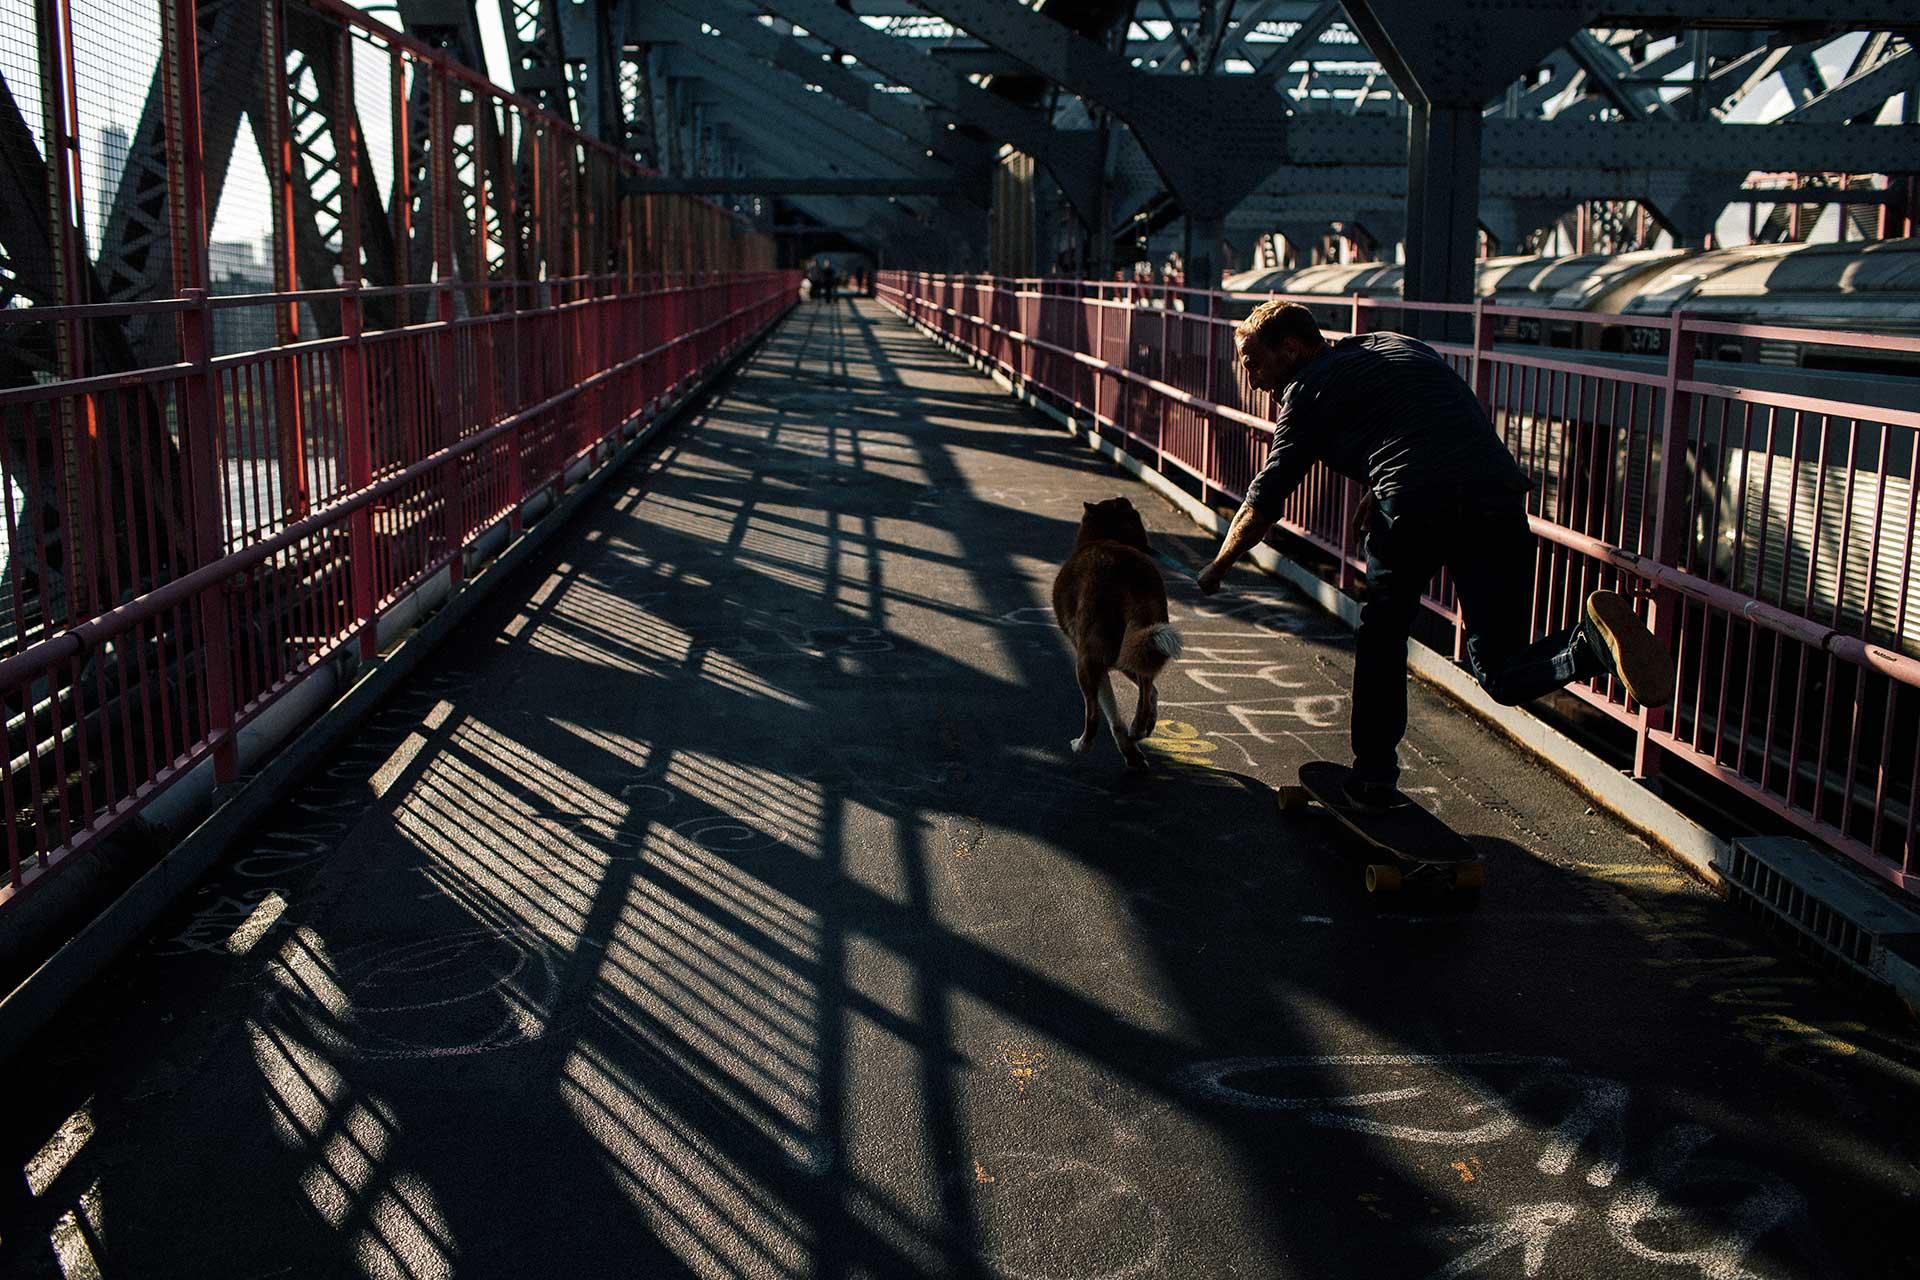 Skateboarder Hund Urban Lifestyle Fotograf New York Brücke